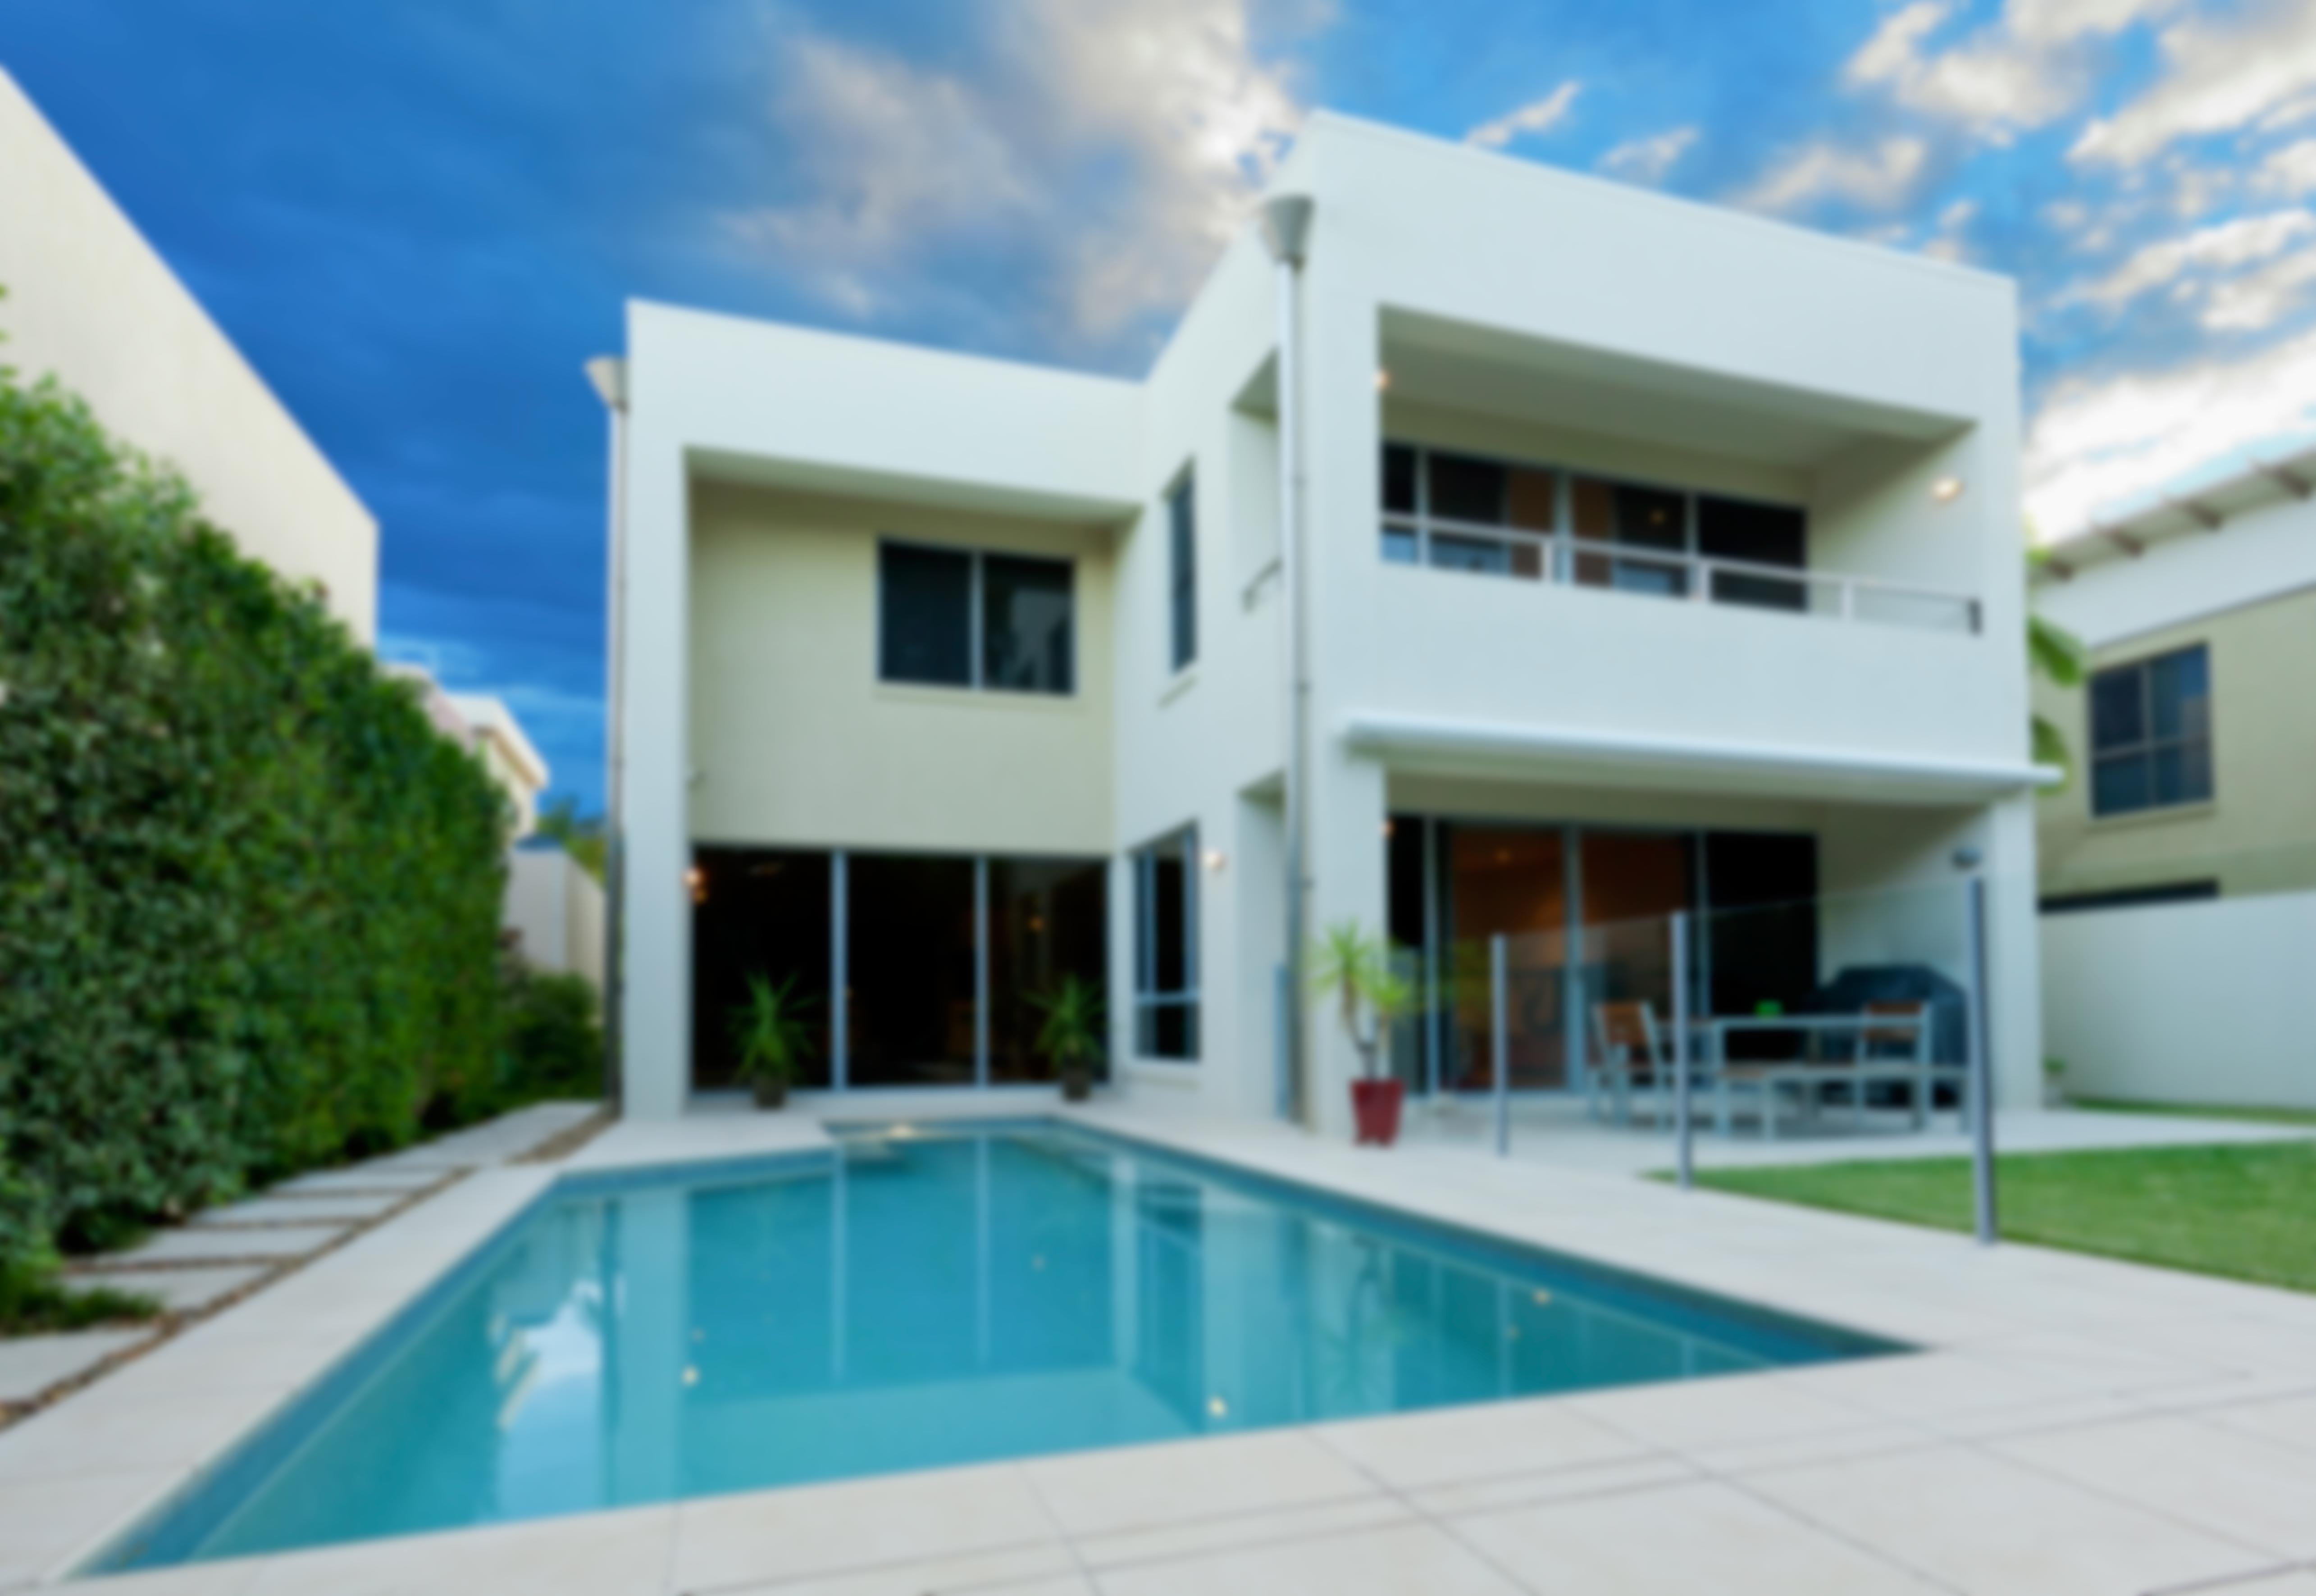 https://assets.boxdice.com.au/one-agency/attachments/c3e/255/property_rent_banner2.jpg?ea9f35845d7380d39a388f5f2d2f6cb6